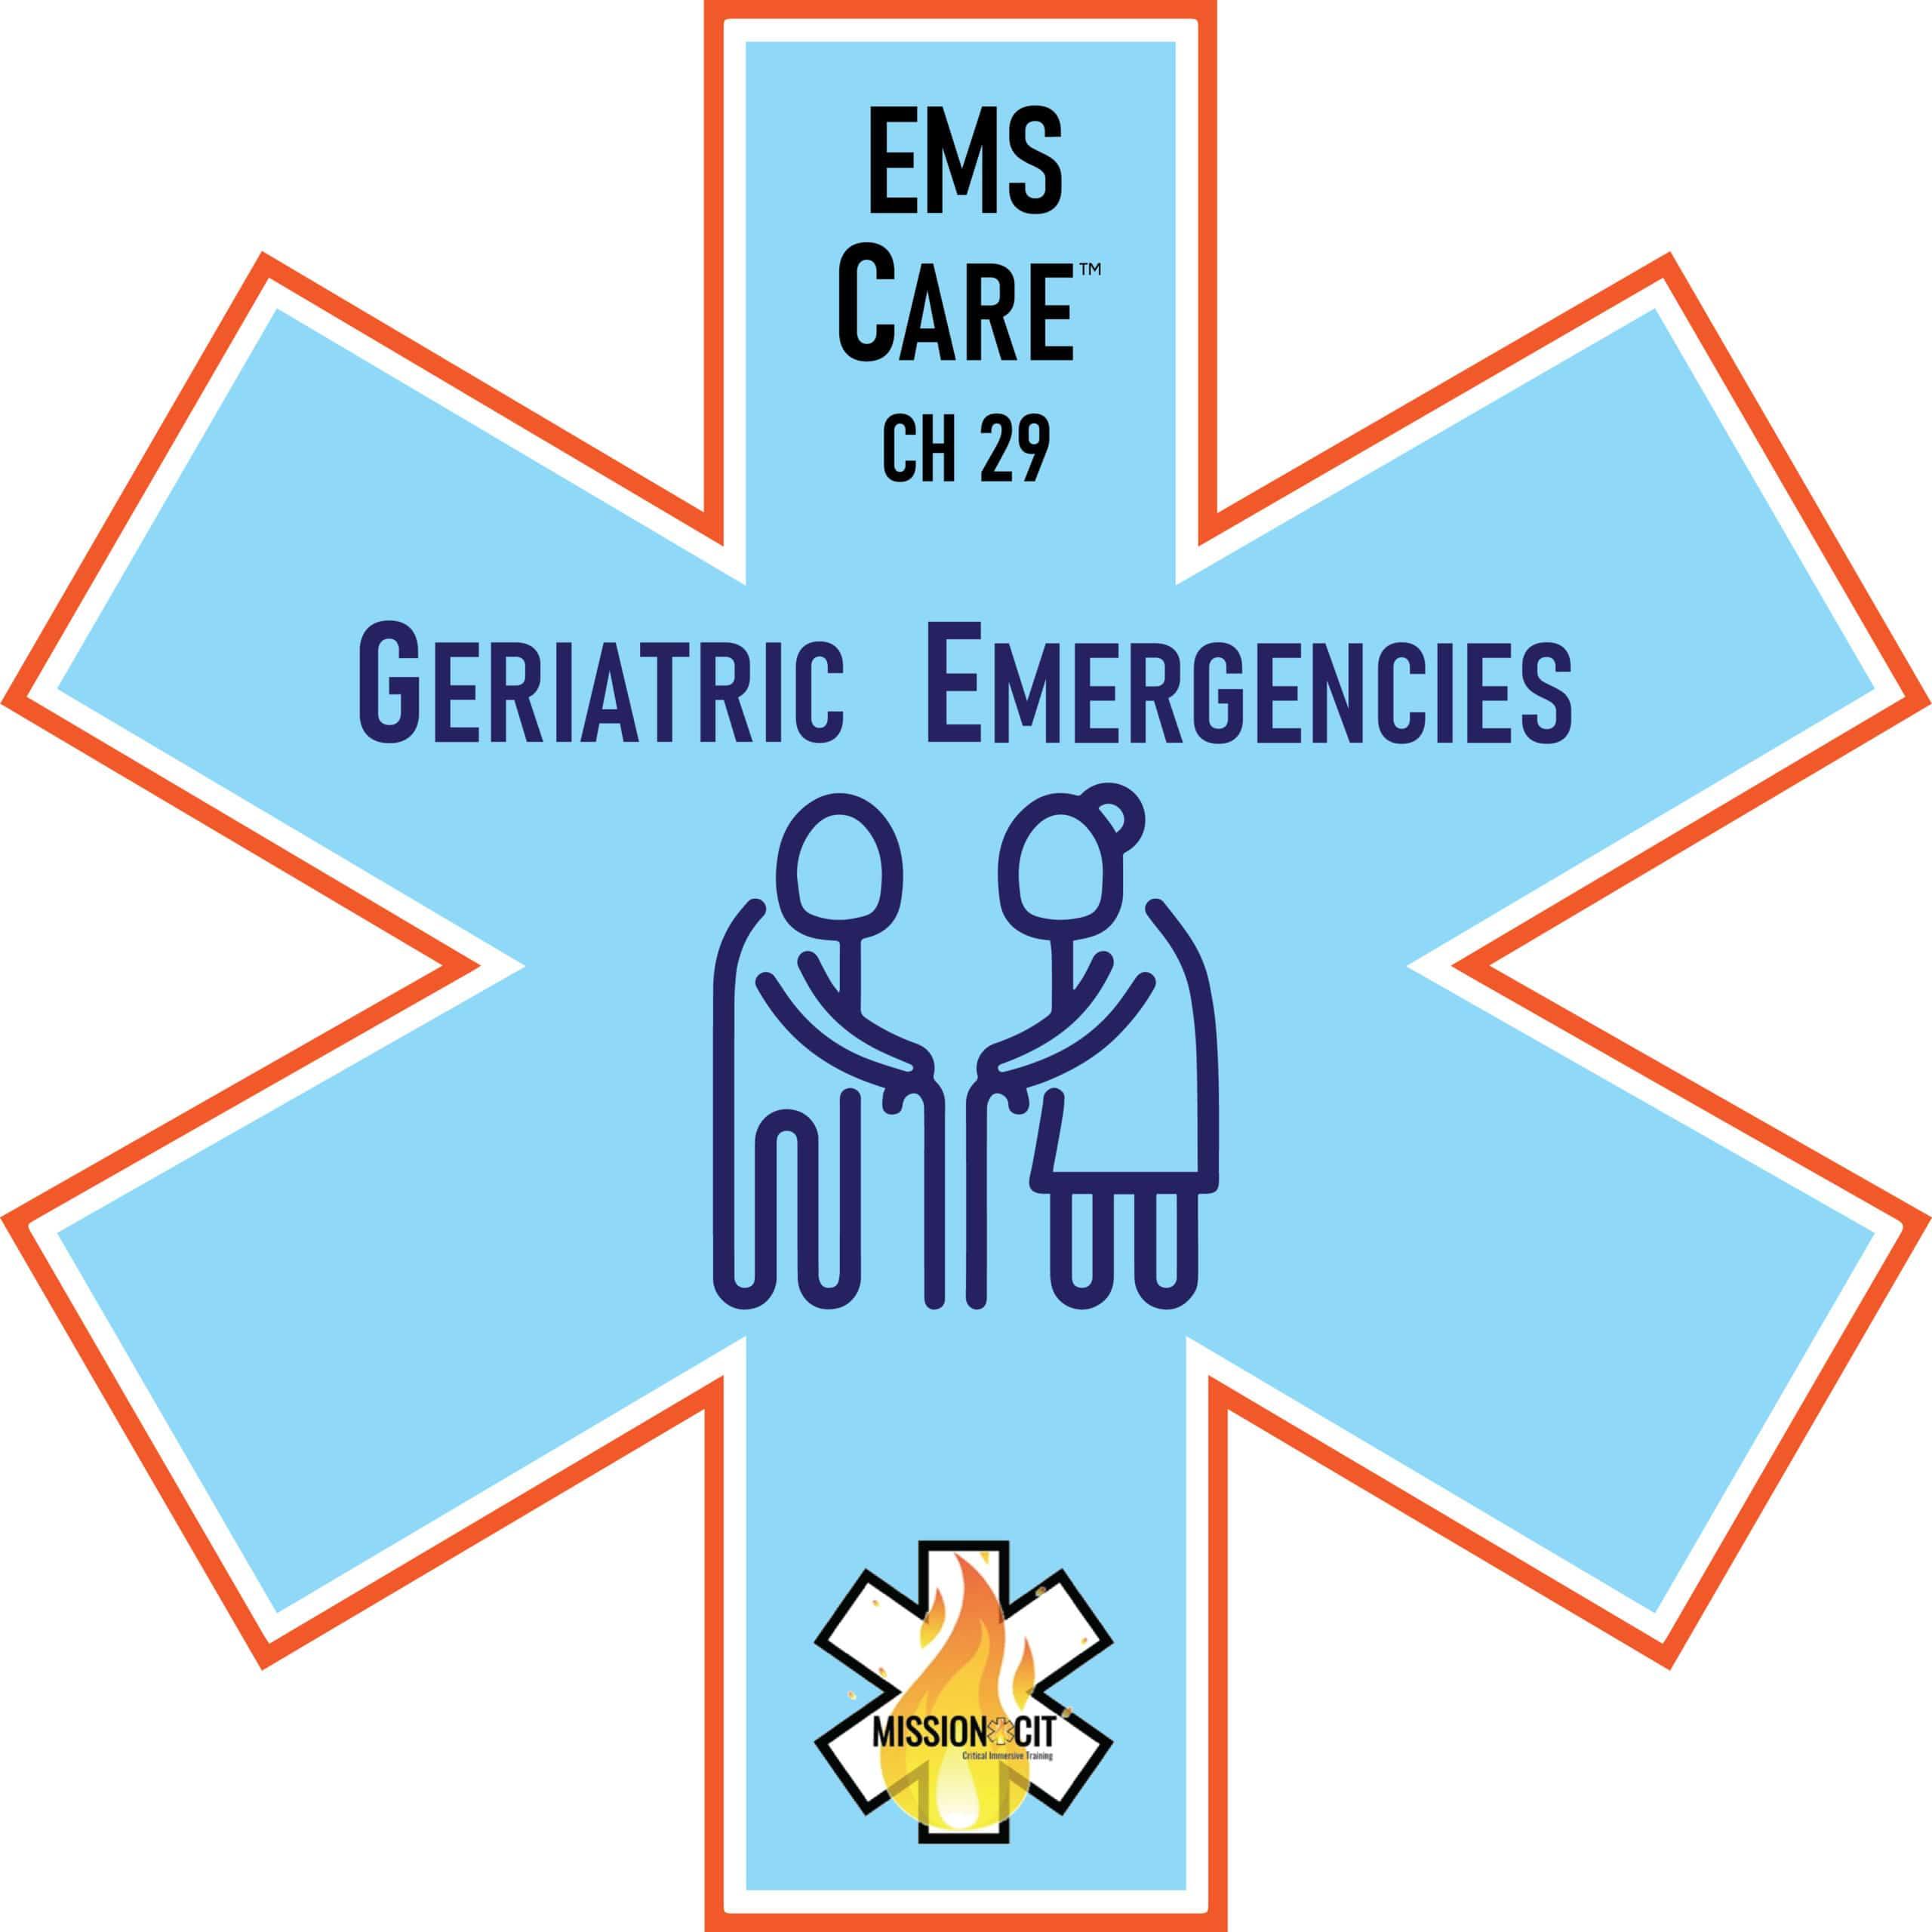 EMS Care Chapter 29 | Geriatric Emergencies